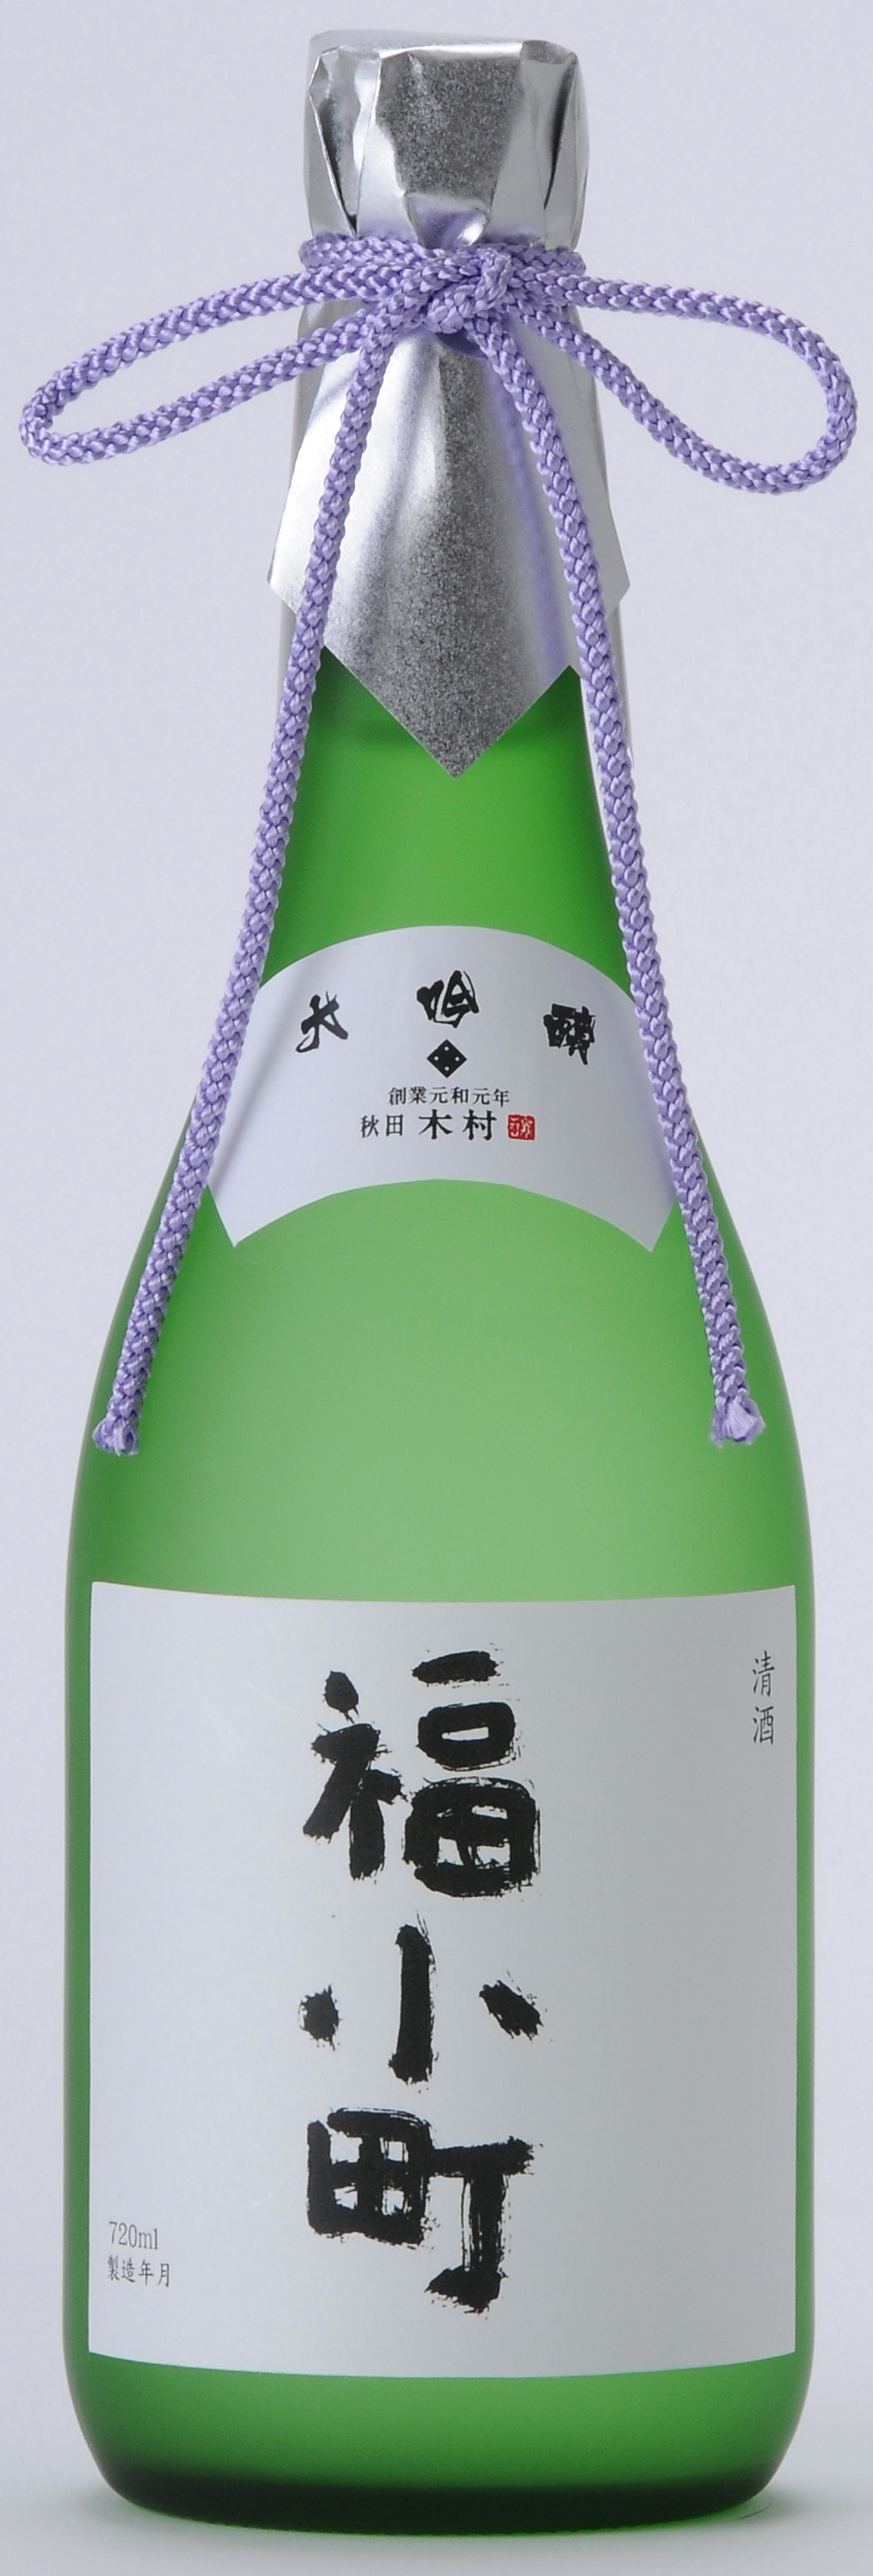 「IWC 2014」 木村酒造「大吟醸 福小町(山田錦)」ゴールドメダル受賞!